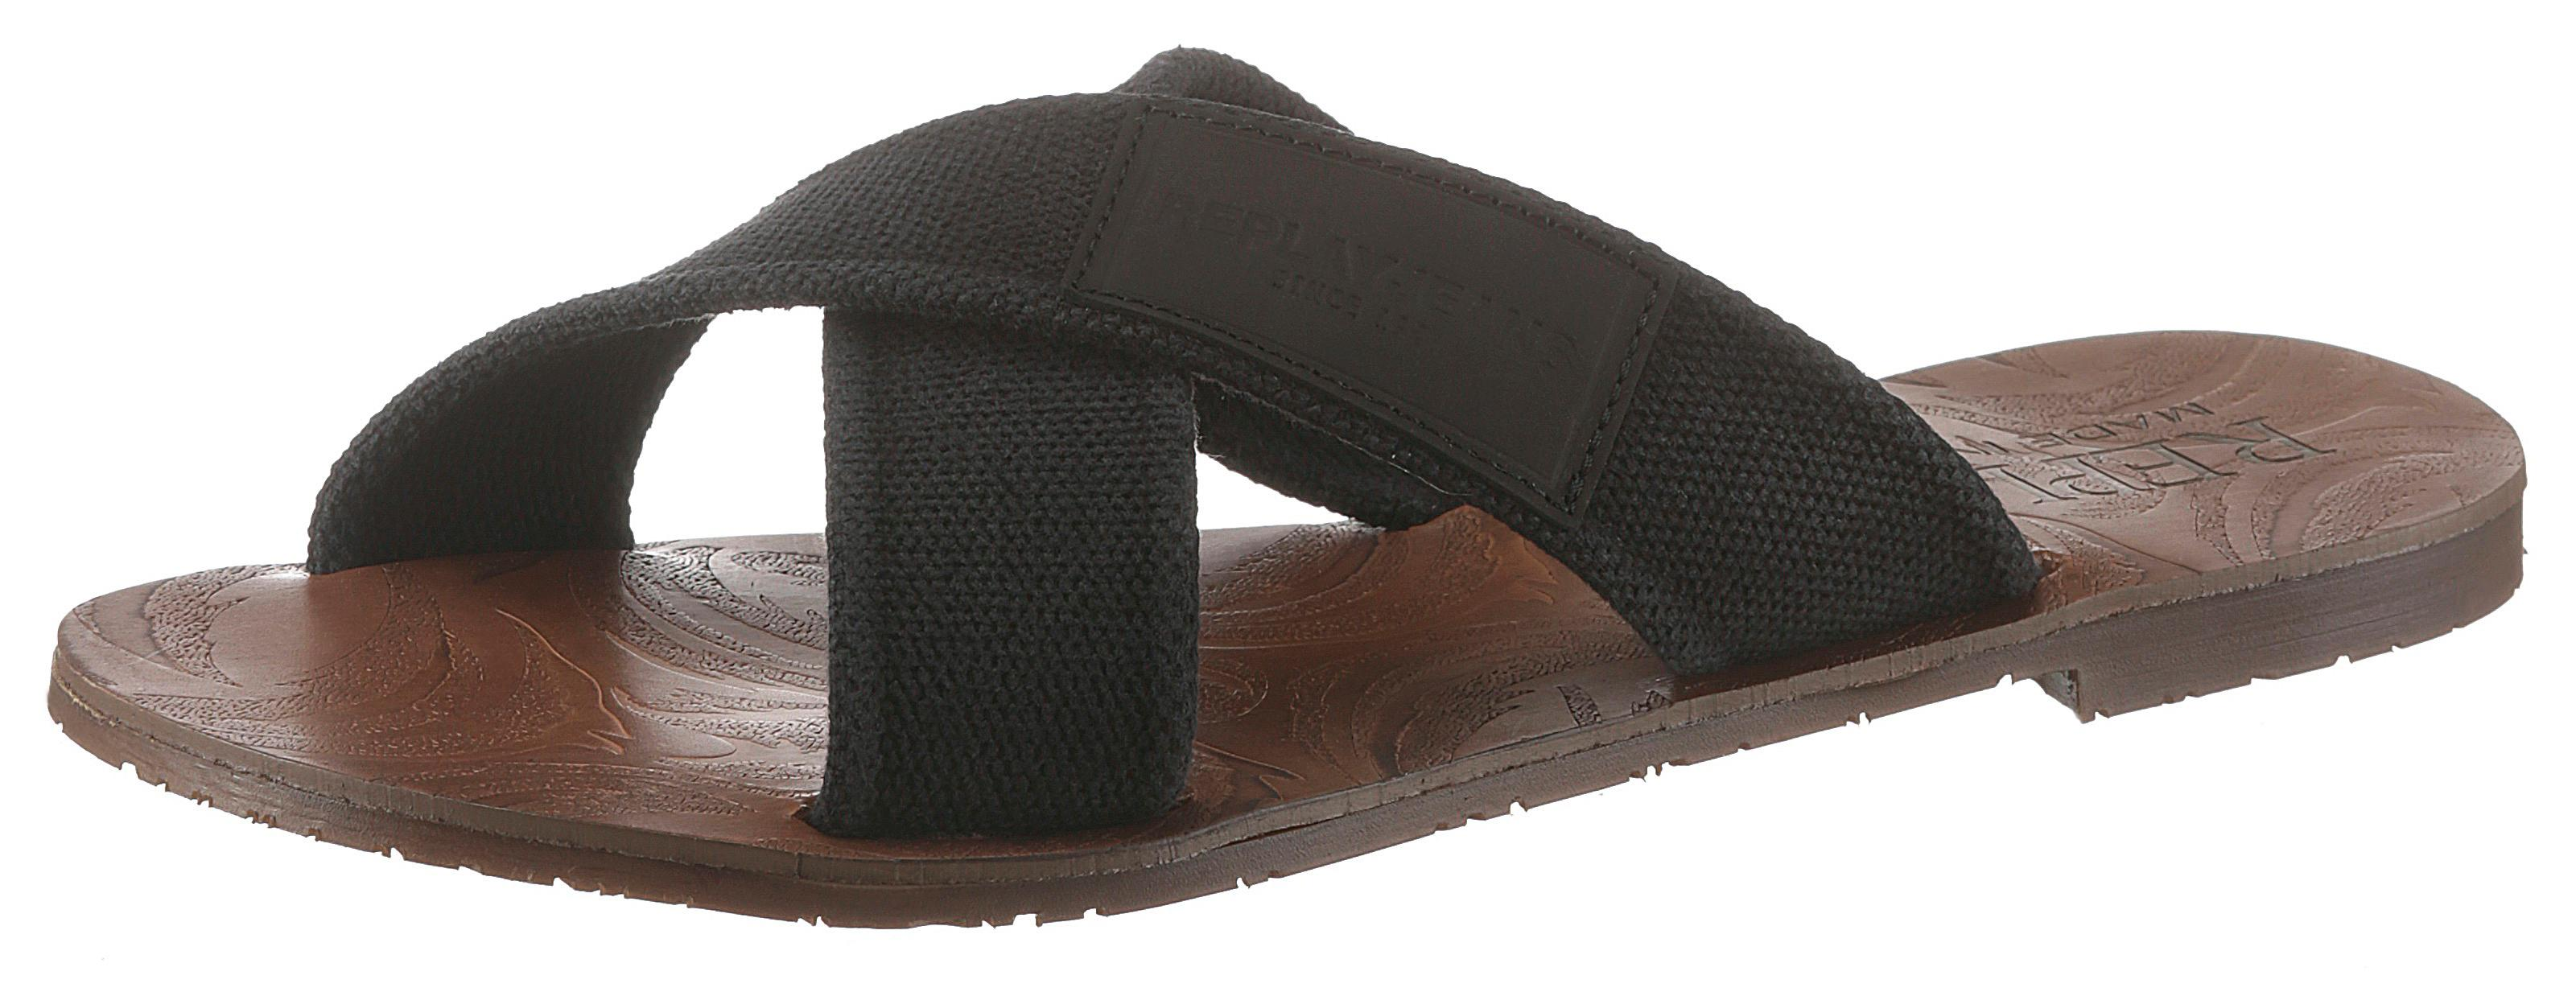 Replay Pantolette | Schuhe > Clogs & Pantoletten | Schwarz | Replay